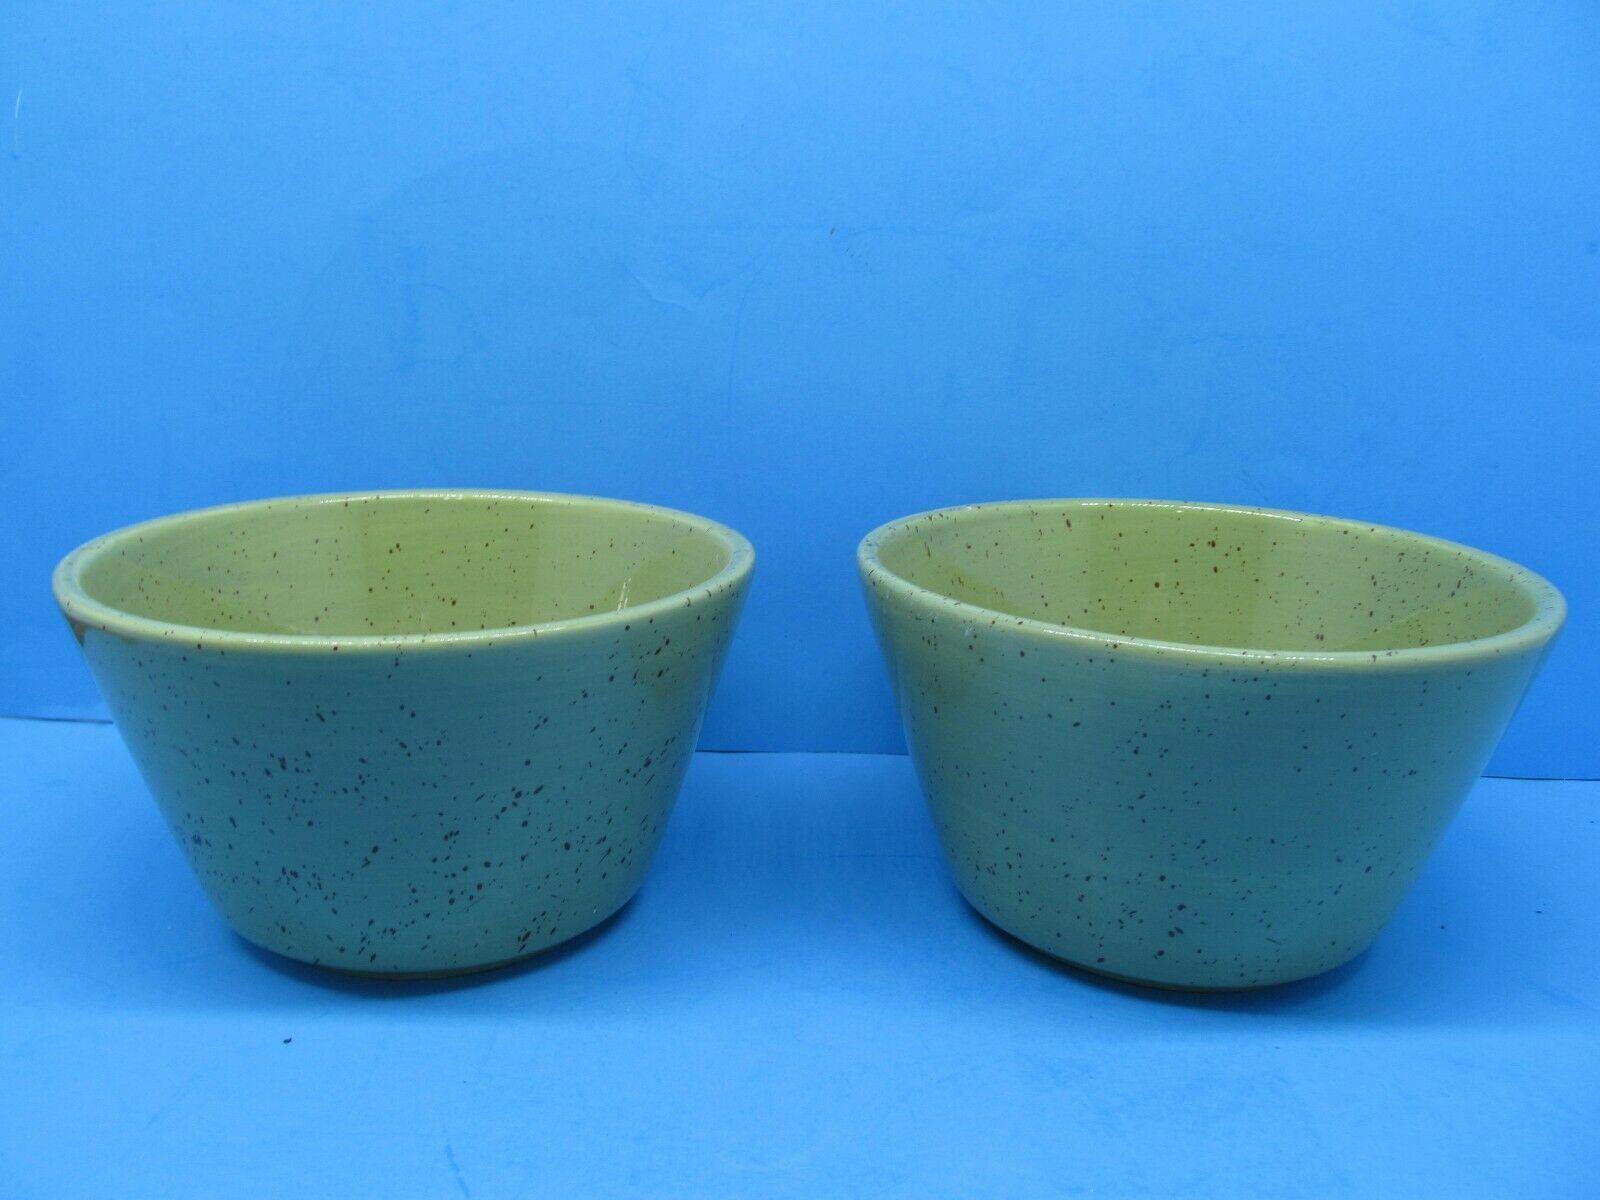 Pfaltzgraff Nuance of Sage Cereal Soup Bowls Discontinued Bundle of 2 - $19.18